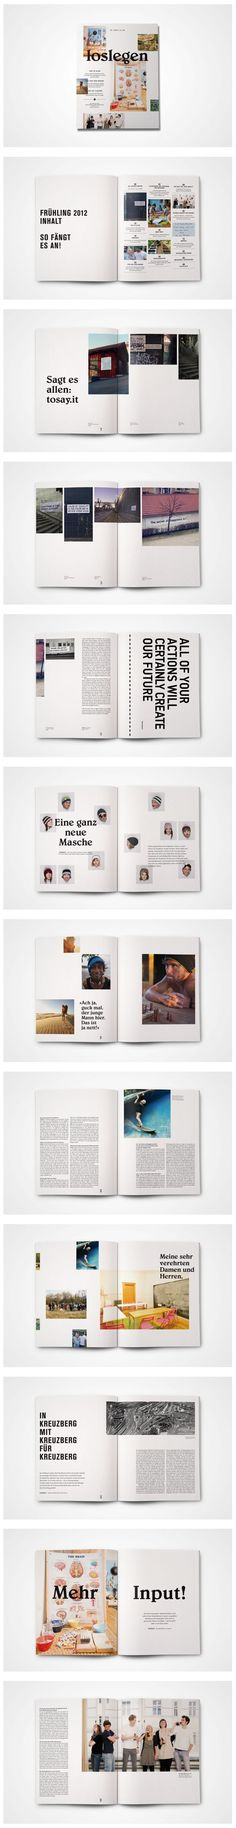 Loslegen Magazine http://www.behance.net/gallery/loslegen-magazine/7792403?utm_content=buffer8eee0&utm_medium=social&utm_source=pinterest.com&utm_campaign=buffer